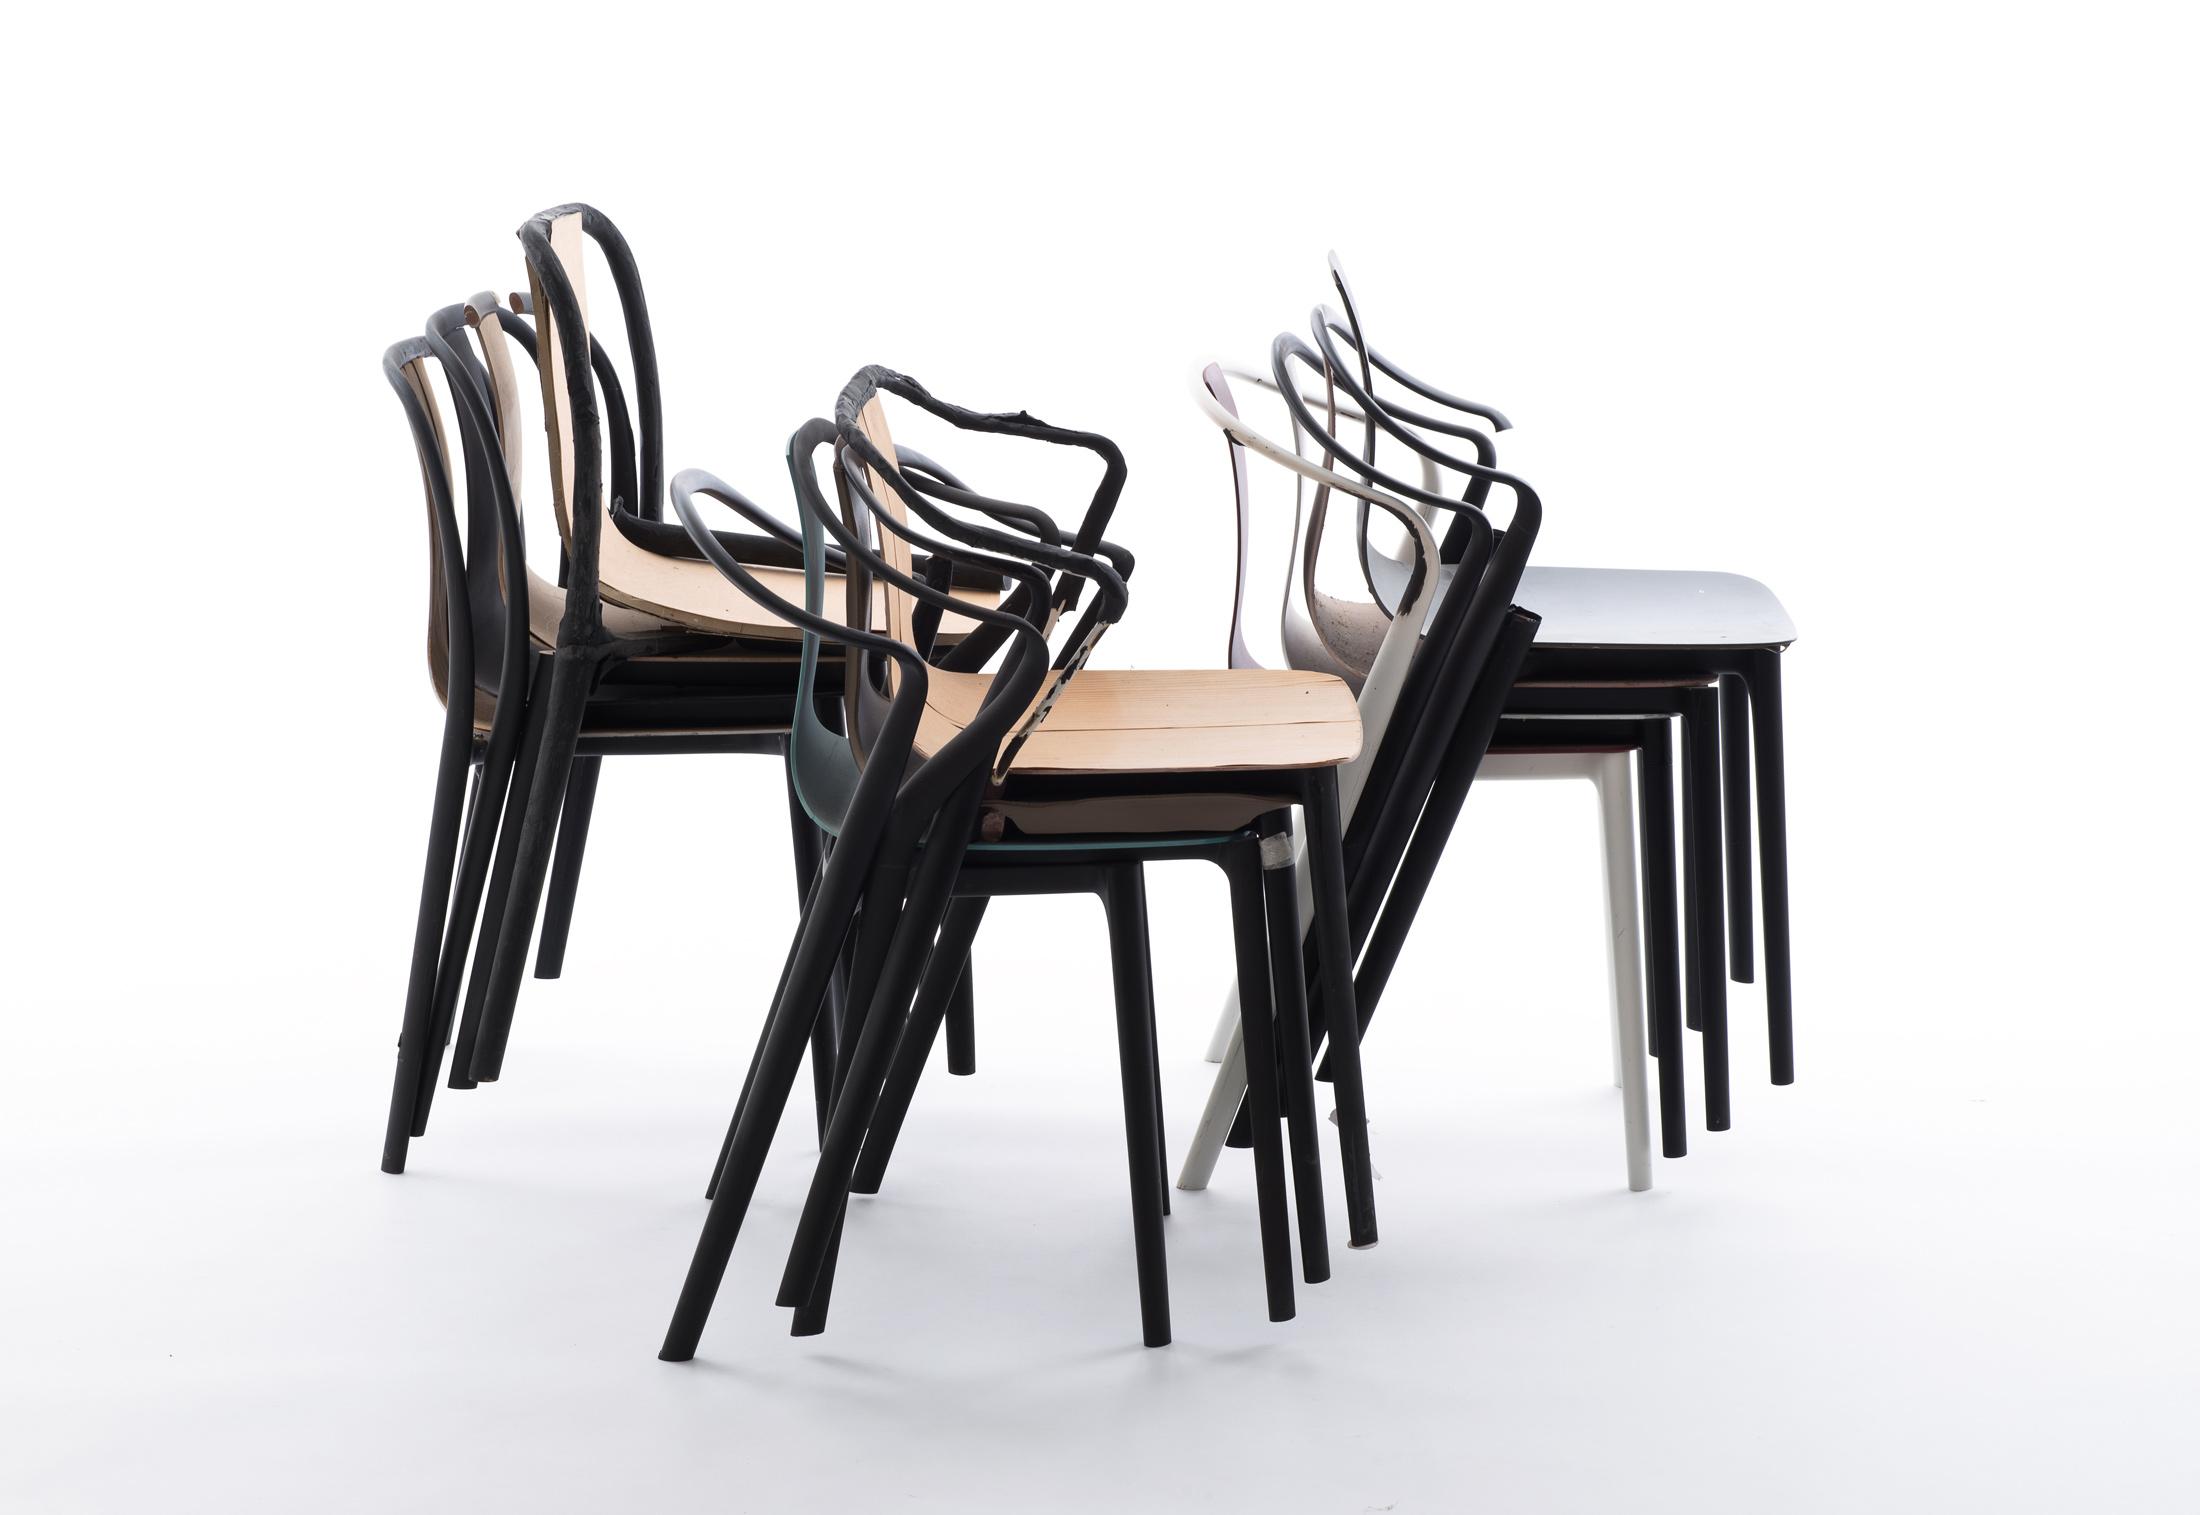 belleville chair by vitra stylepark. Black Bedroom Furniture Sets. Home Design Ideas